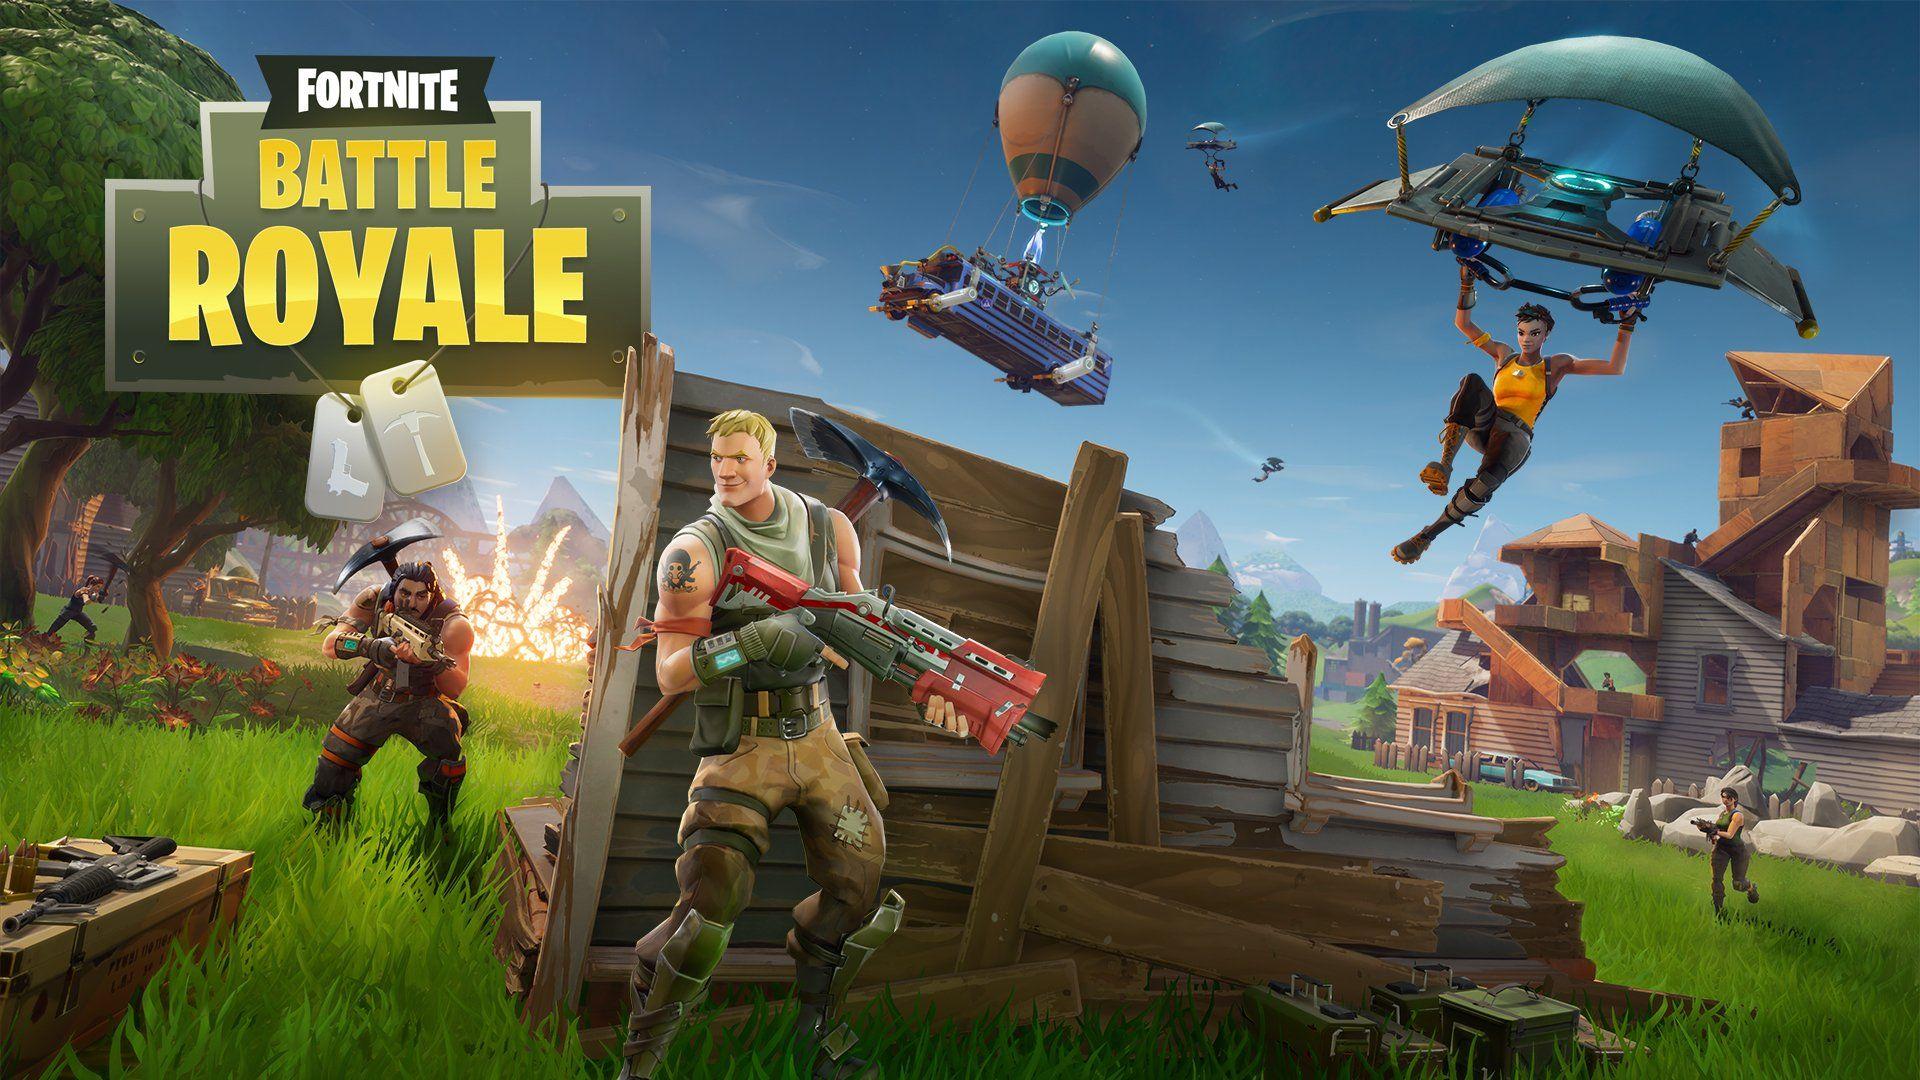 Fortnite-Battle-Royale-HD-Wallpaper-Season-7